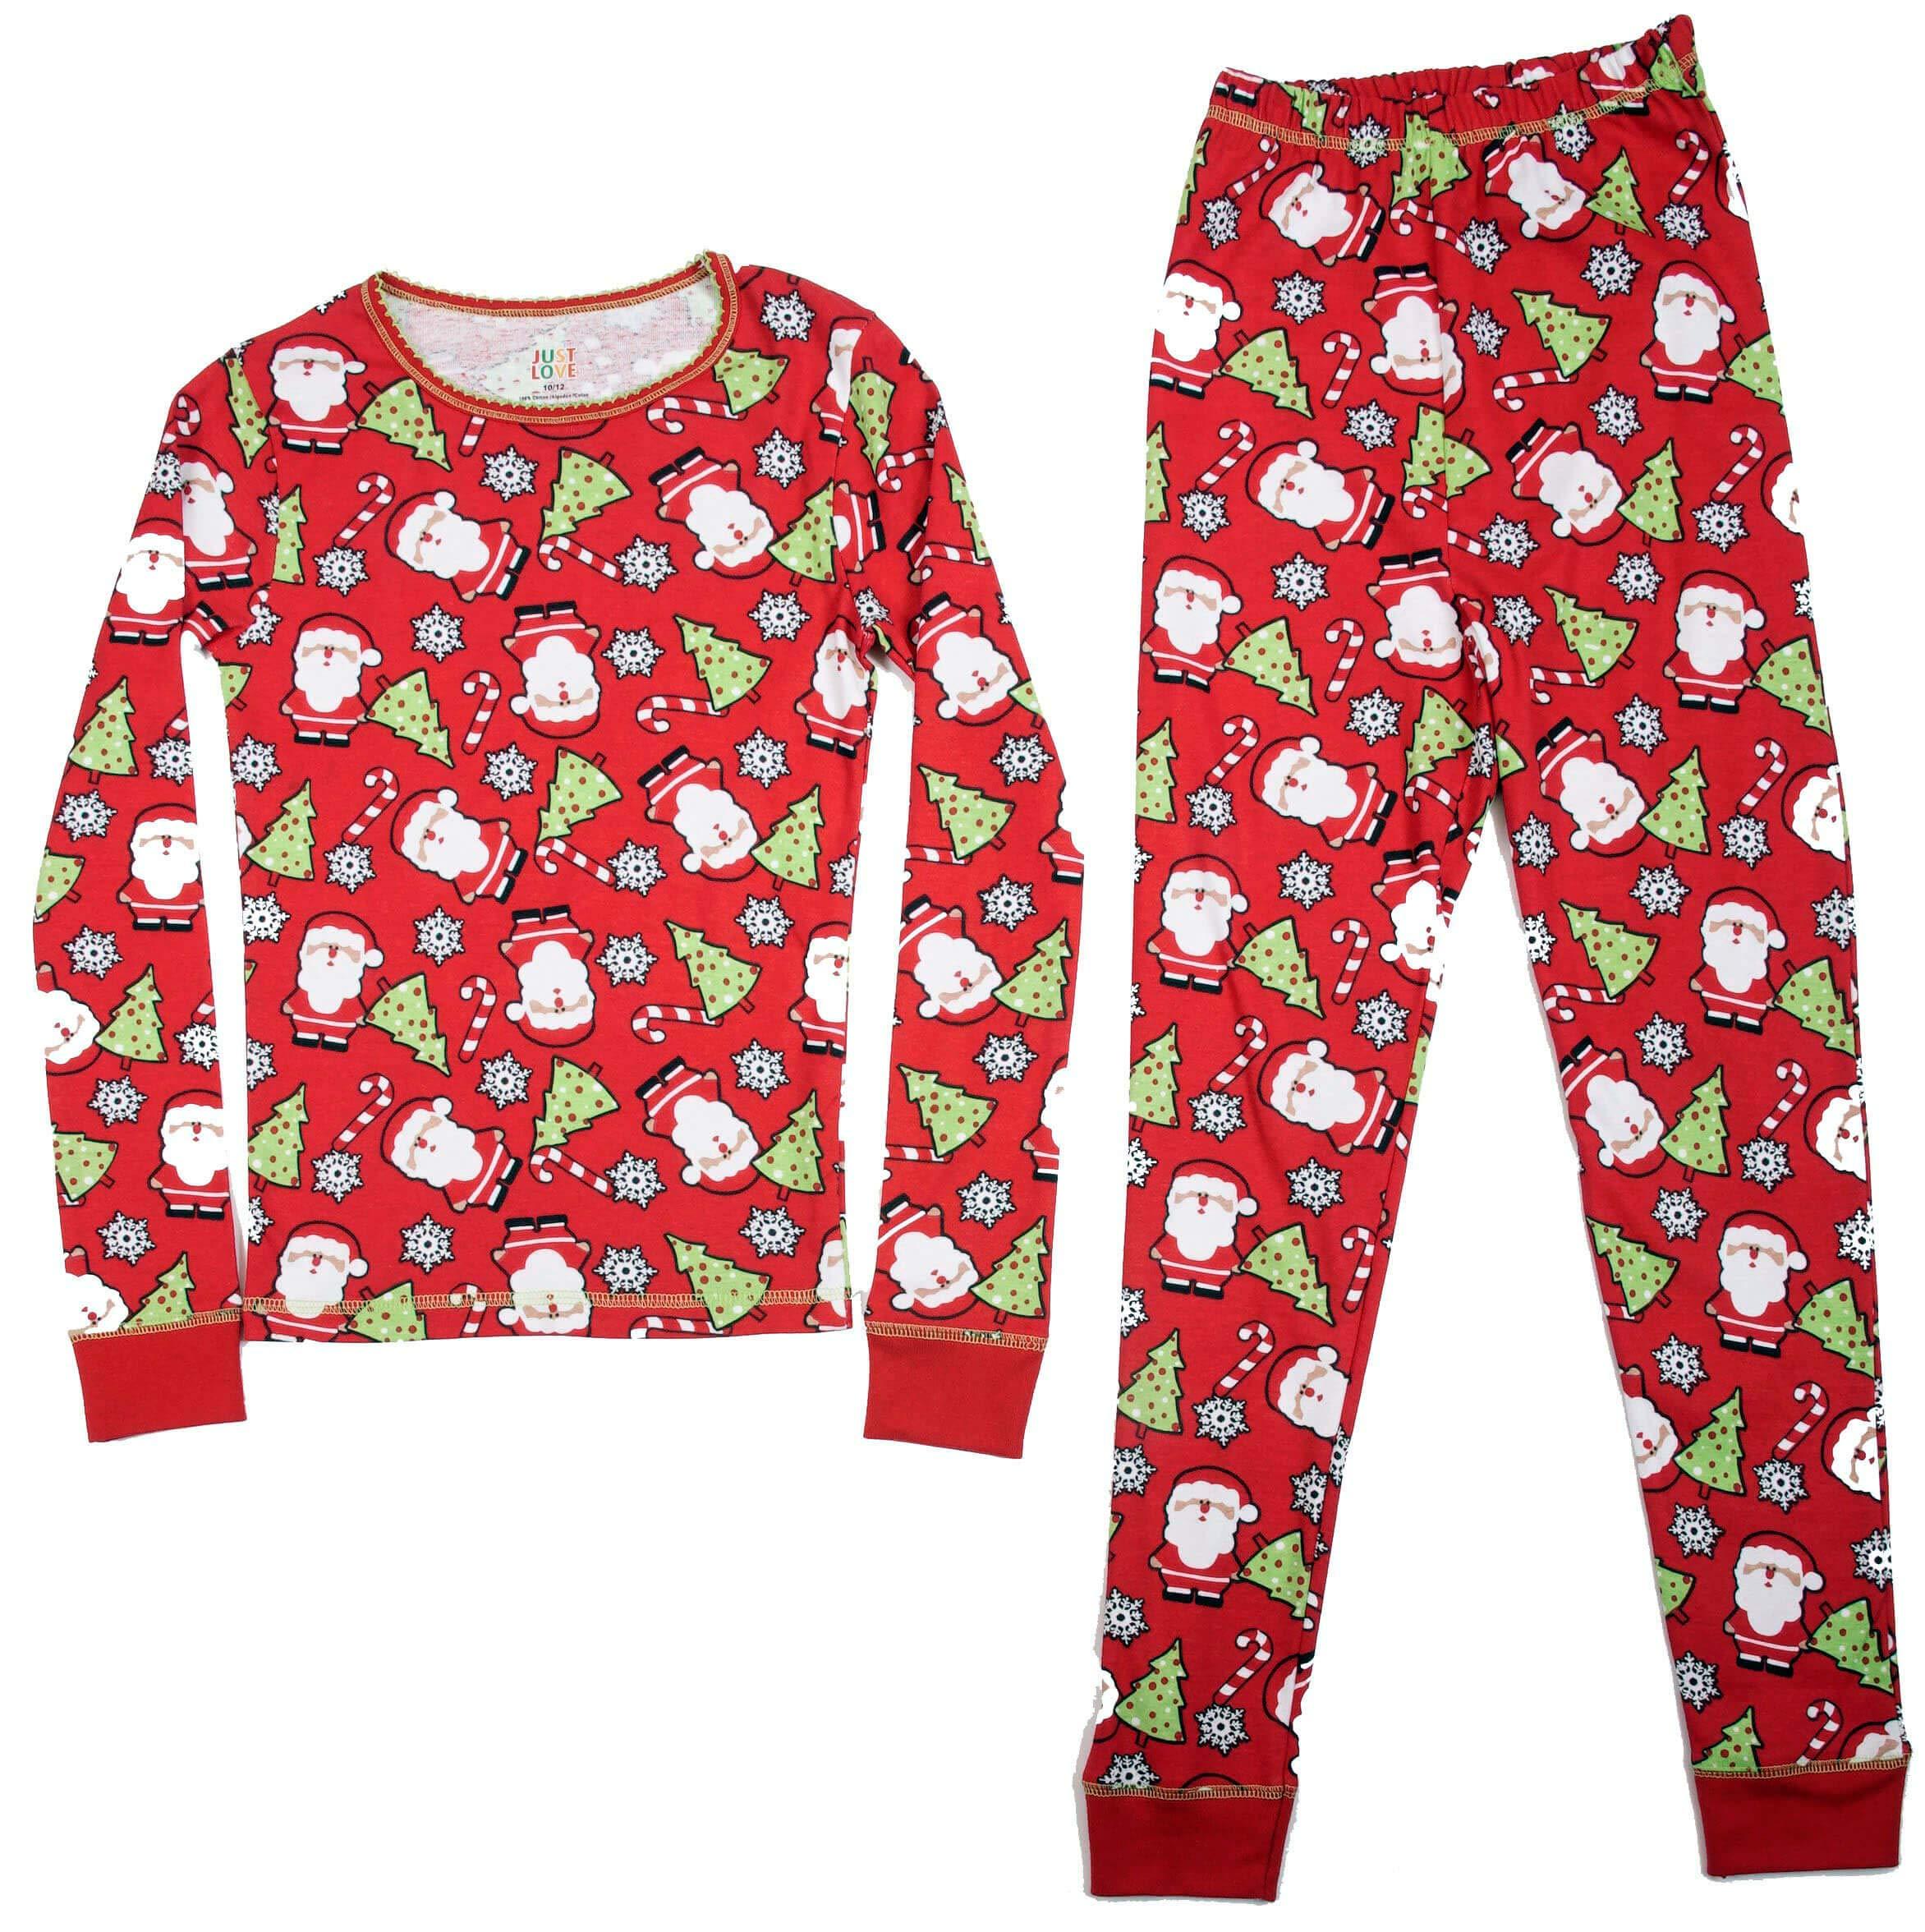 Image of All Over Print Santa Christmas Pajamas for Girls and Toddlers